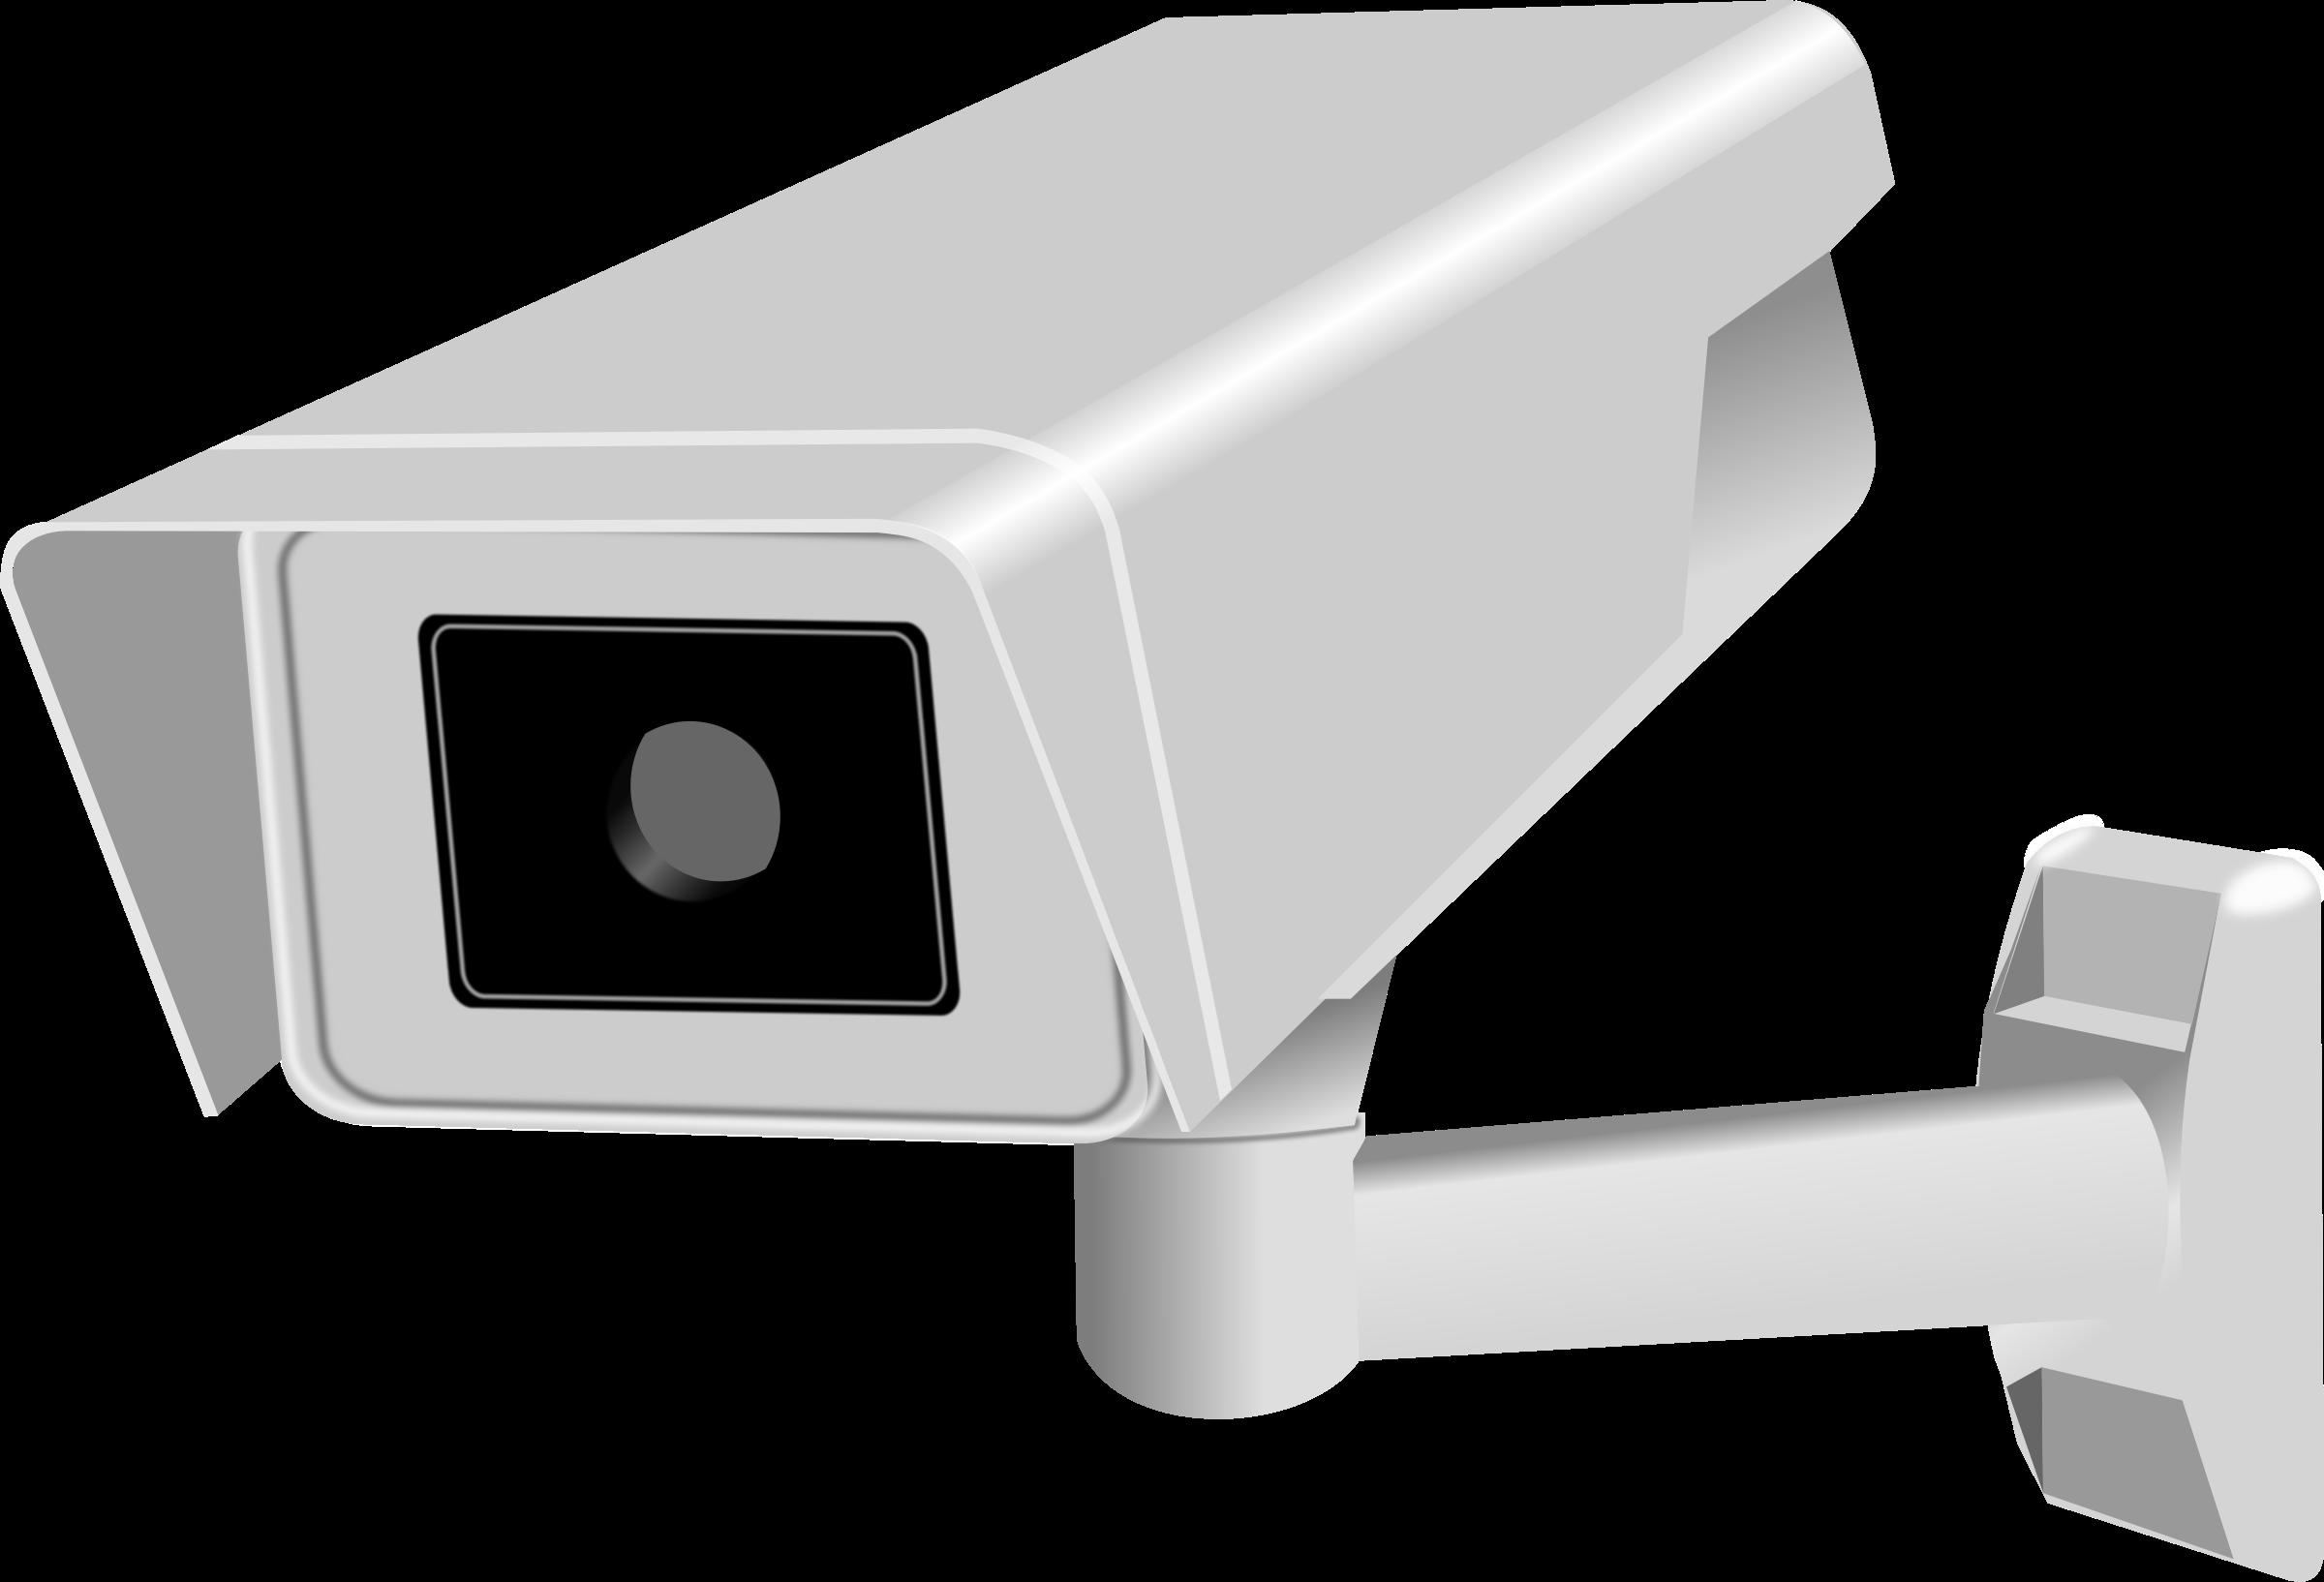 Cctv camera clipart.